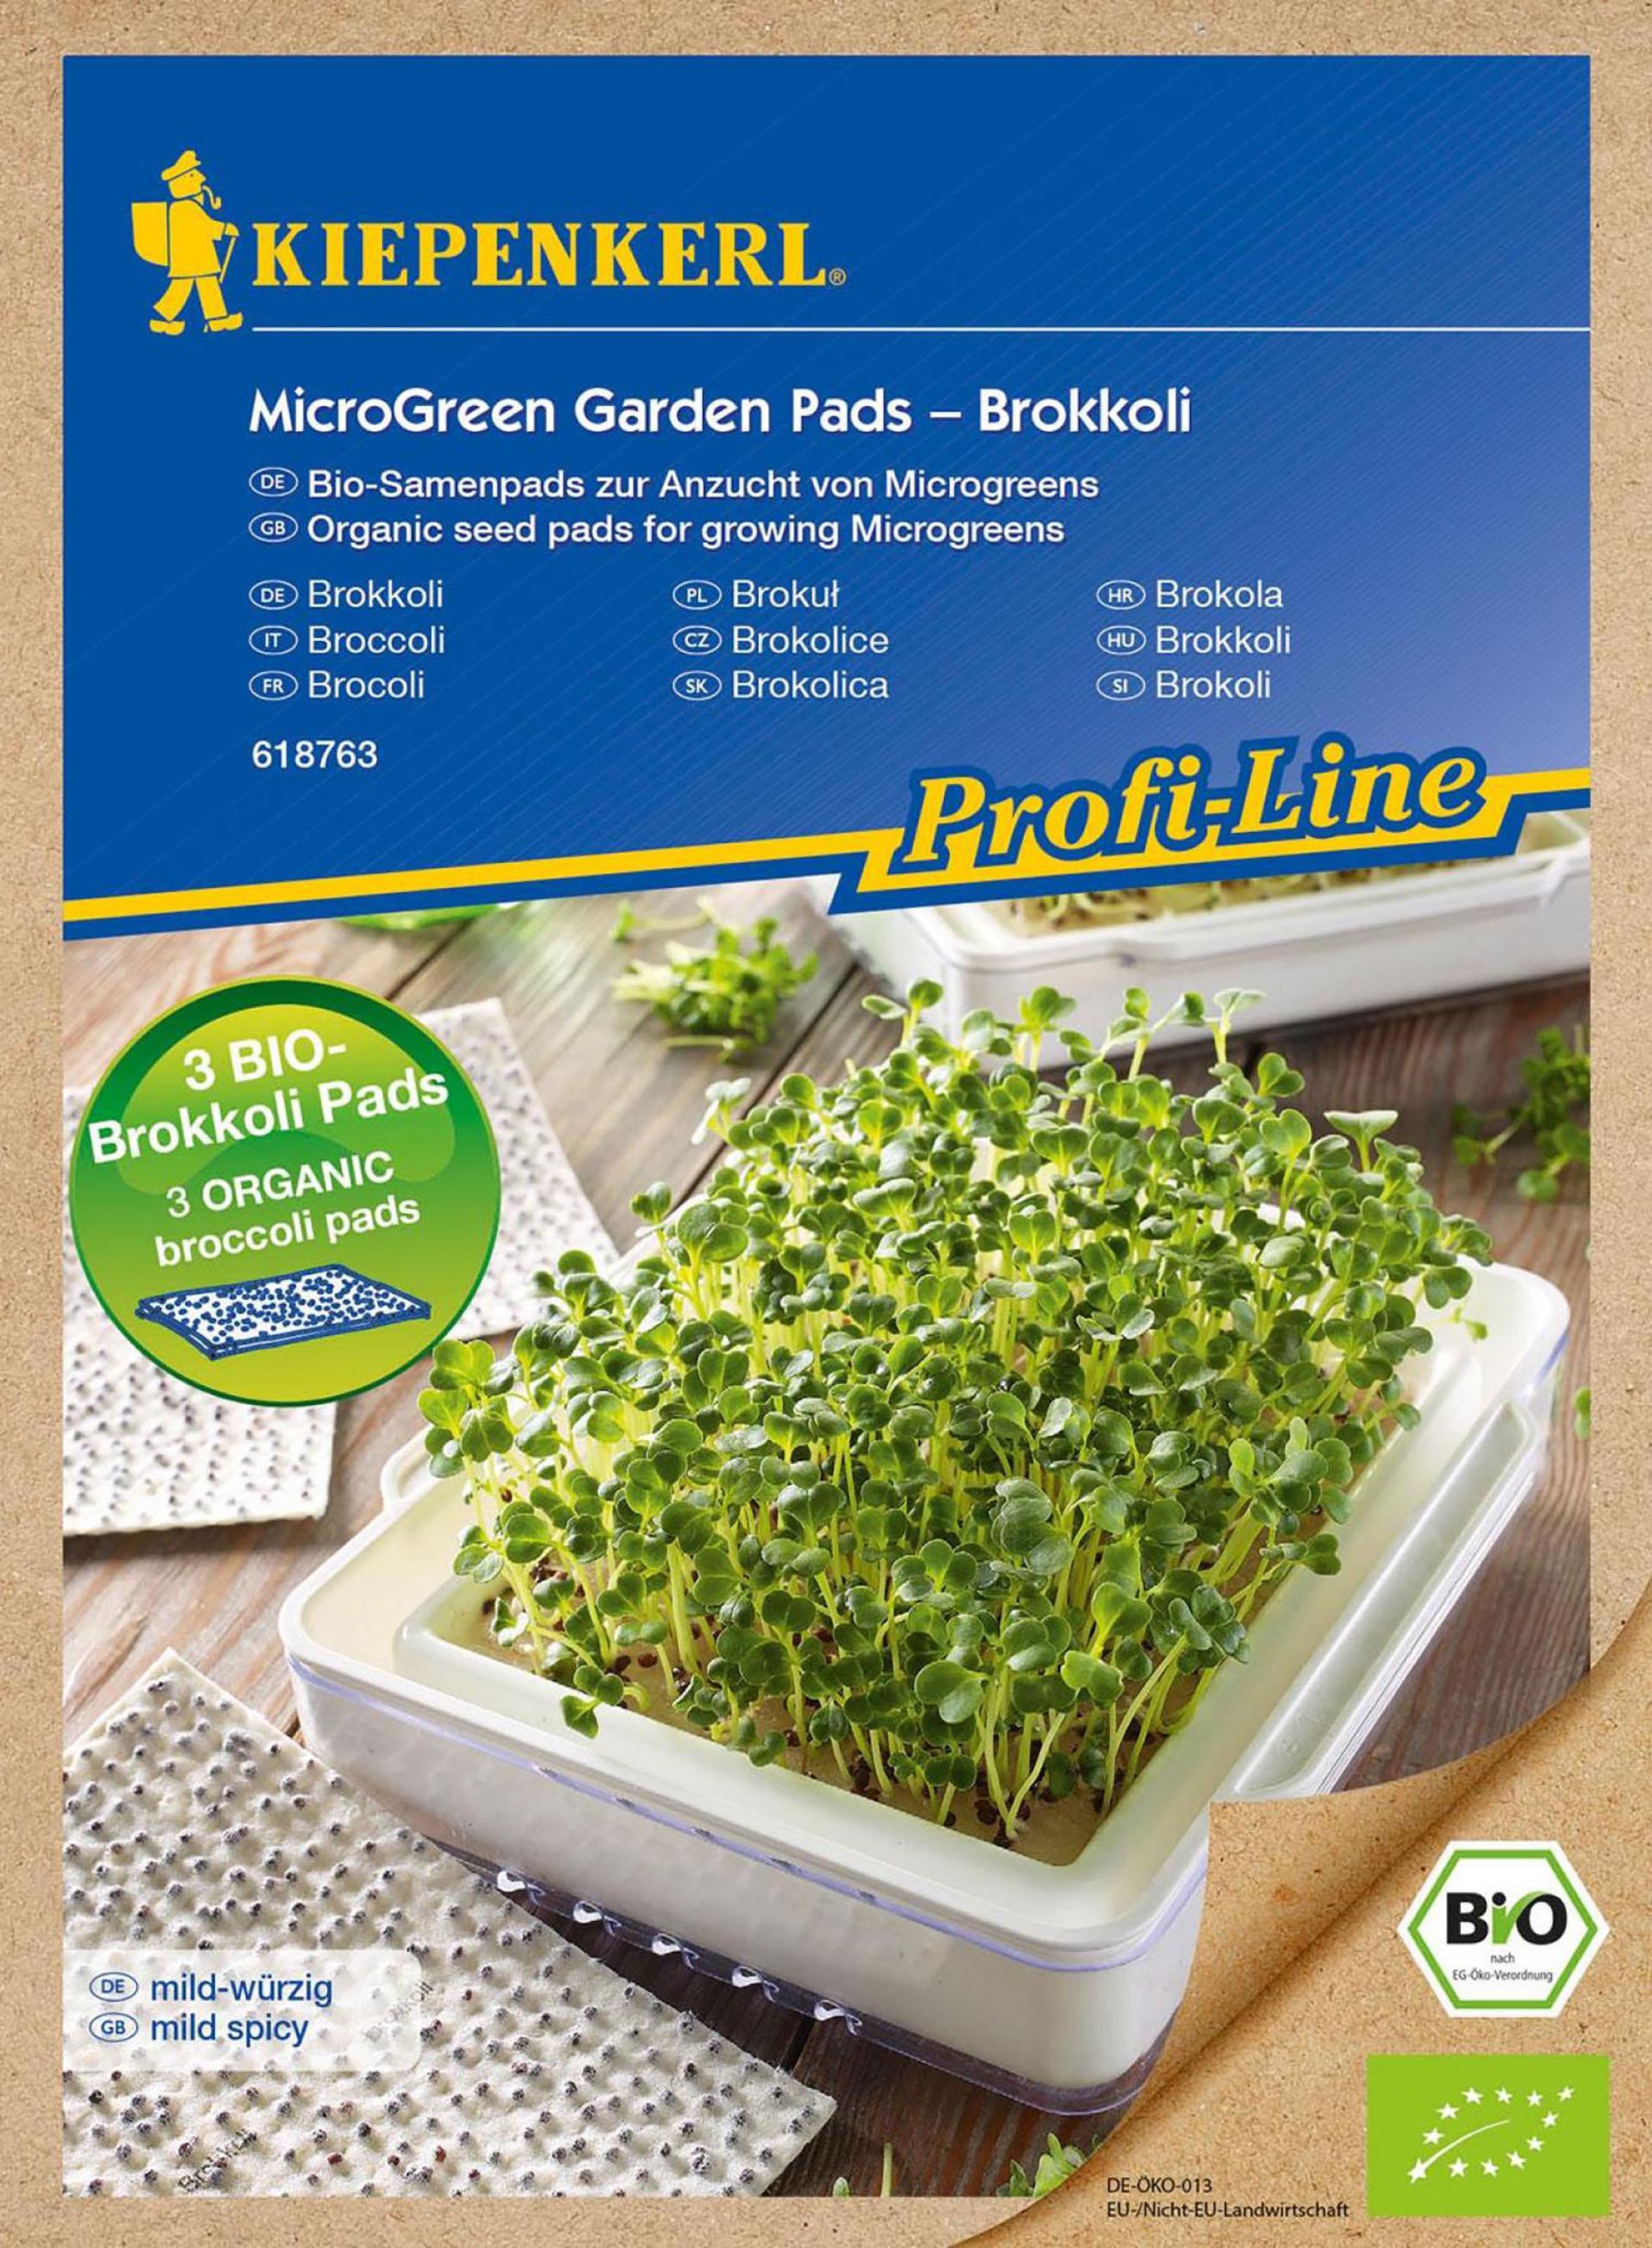 MicroGreen Garden BIO-Brokkoli Nachfüllpads PG-N